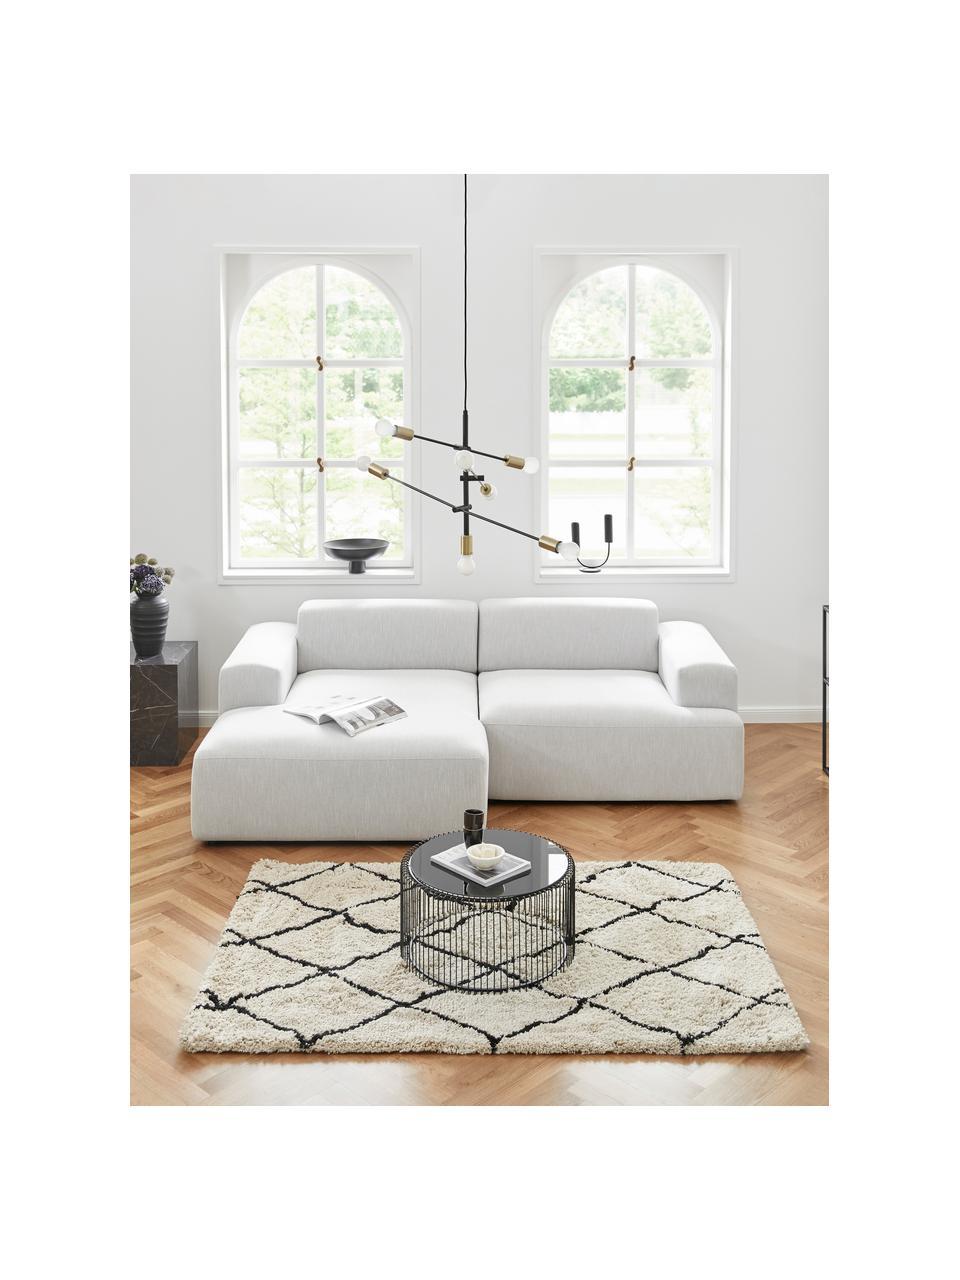 Hoekbank Melva (3-zits) in lichtgrijs, Bekleding: 100% polyester, Frame: massief grenenhout, FSC-g, Poten: kunststof, Lichtgrijs, B 239 x D 143 cm